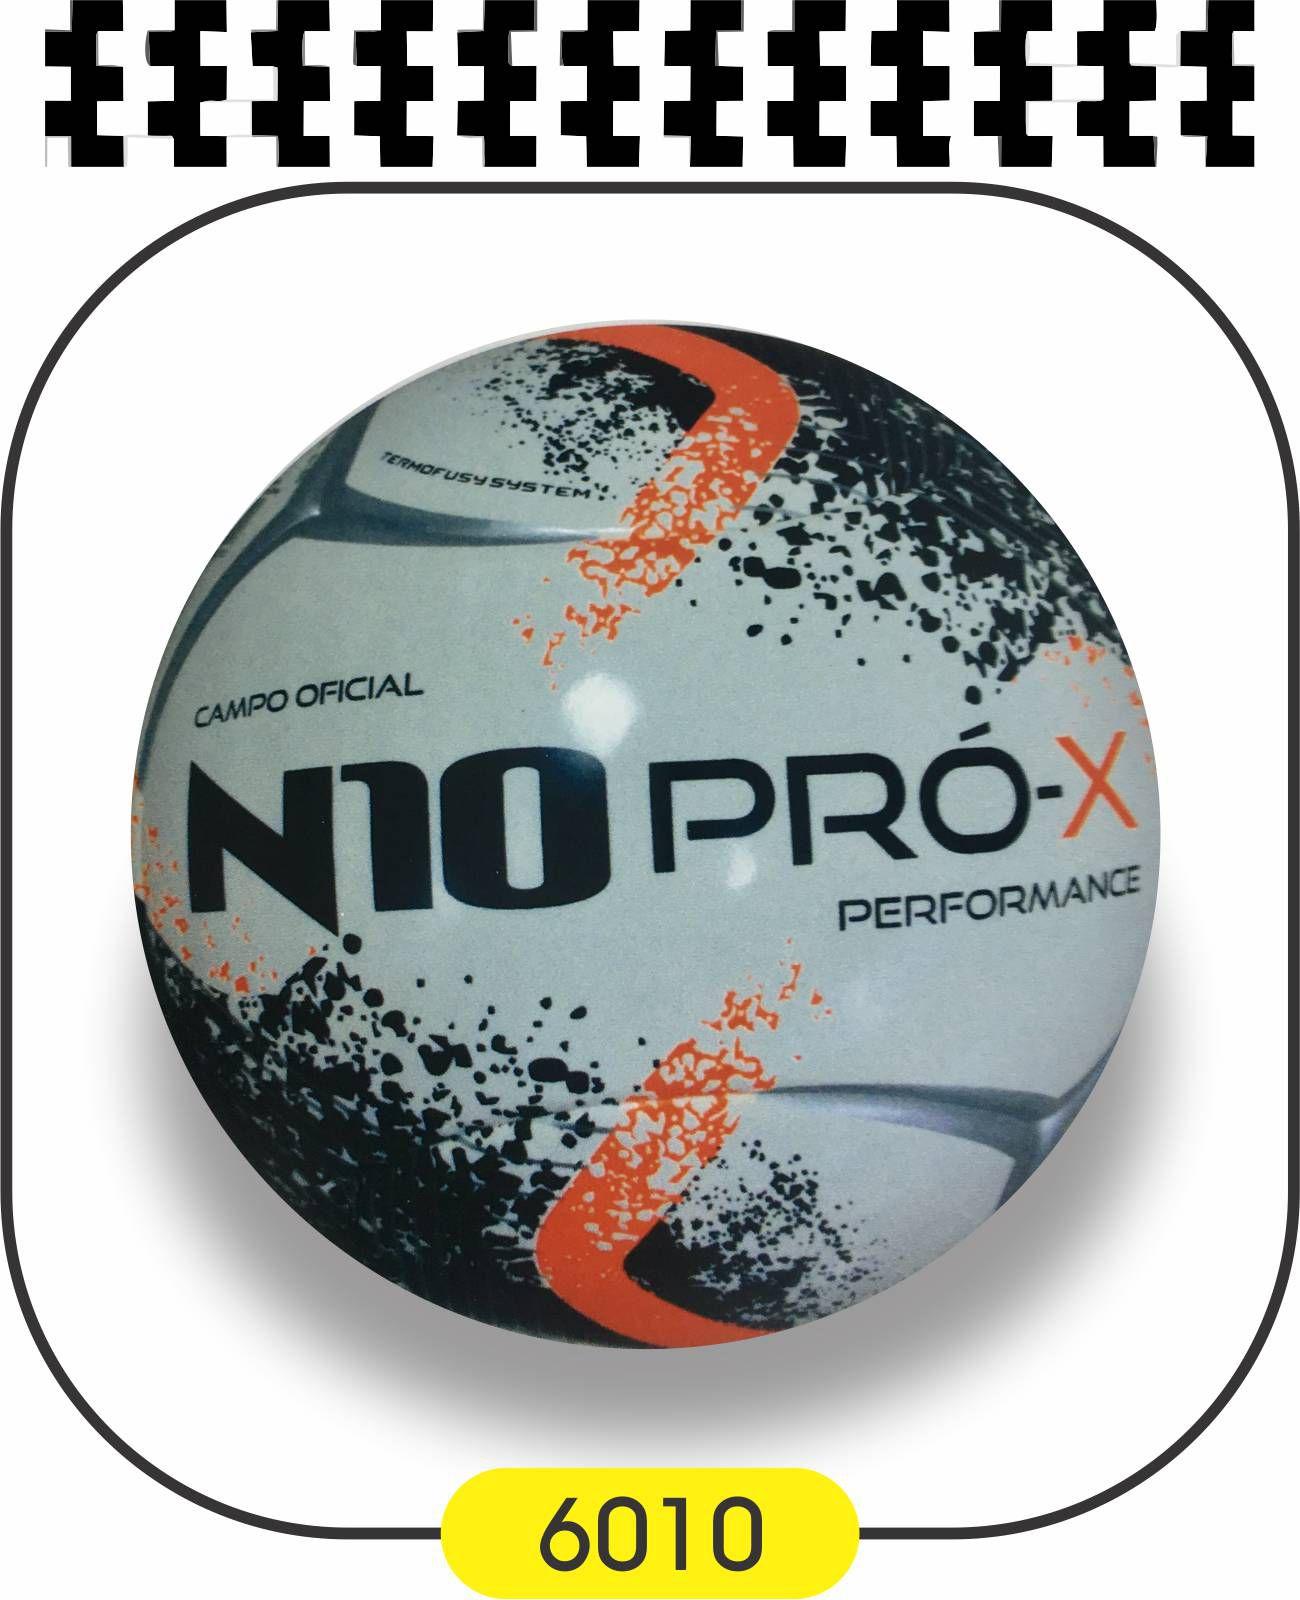 Bola de Futebol de Campo N10 PRO-X PERFORMANCE - TERMOFUSY  - Bolas Lassabia - Bolas e Brindes Personalizados